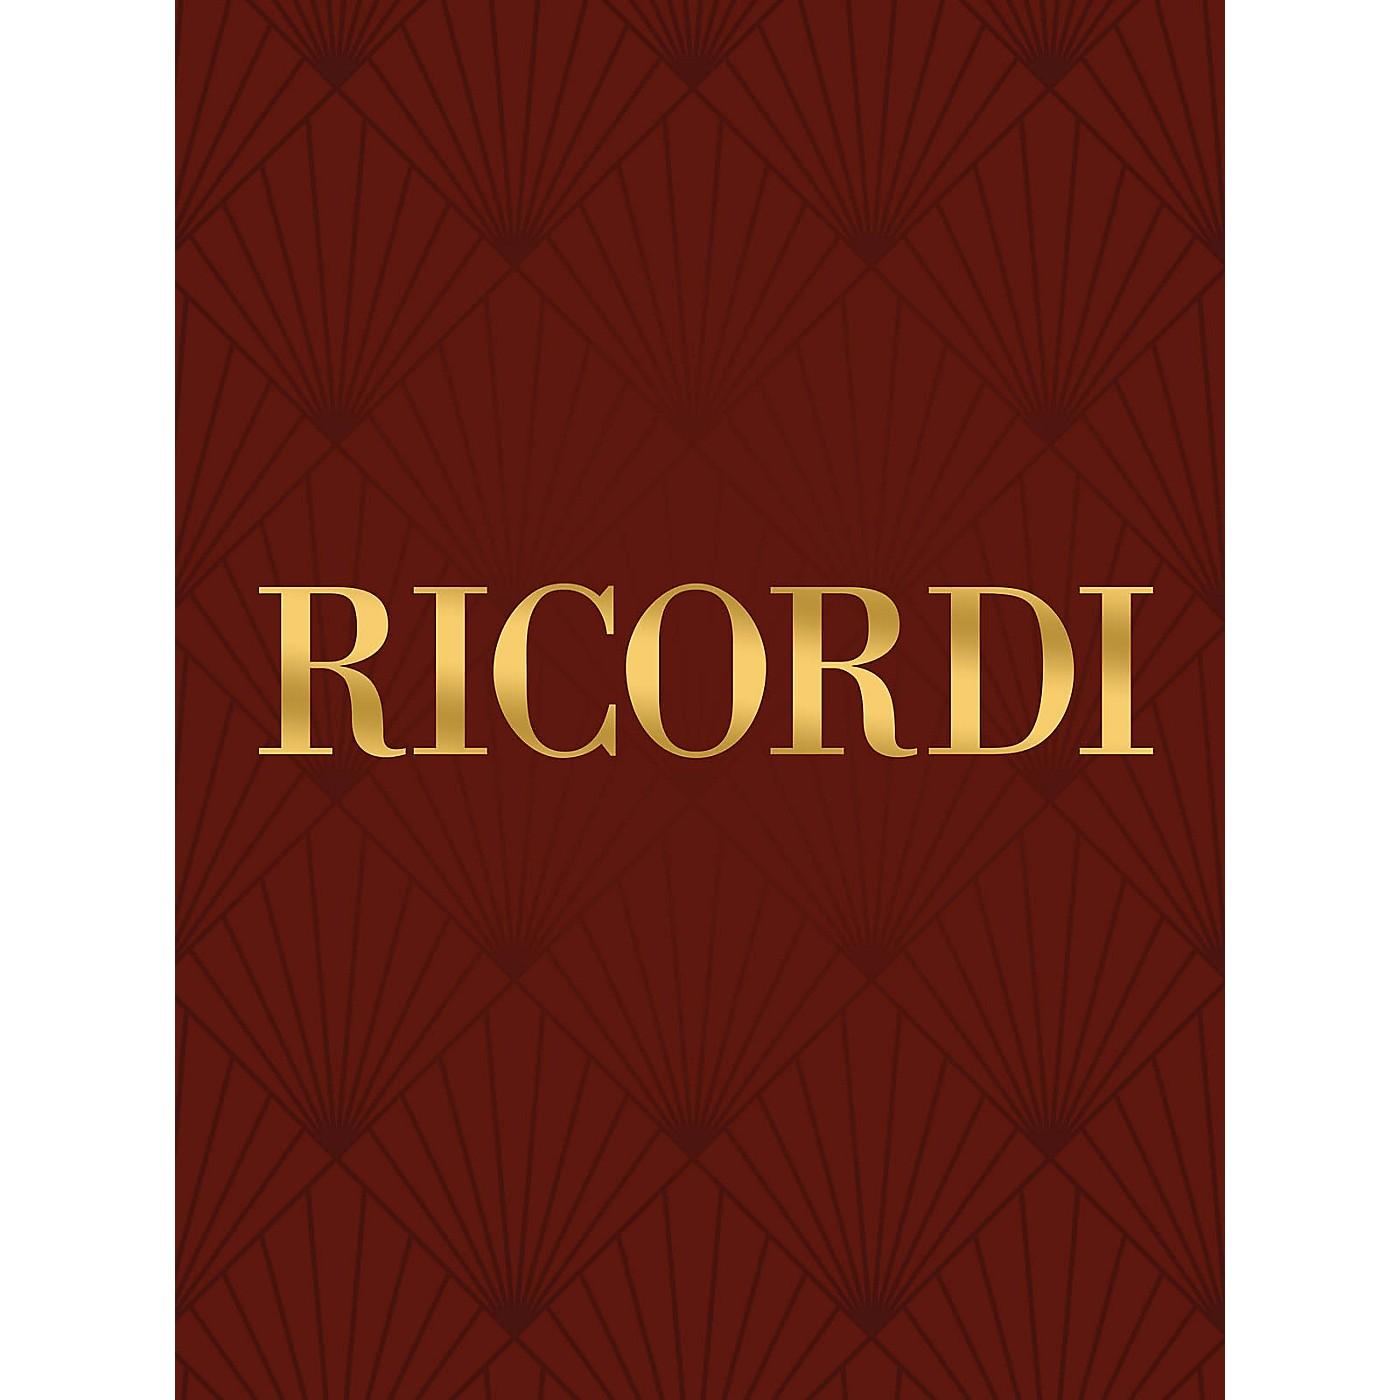 Ricordi Nisi Dominus RV608 (Vocal Score) Composed by Antonio Vivaldi Edited by Vilmos Lesko thumbnail